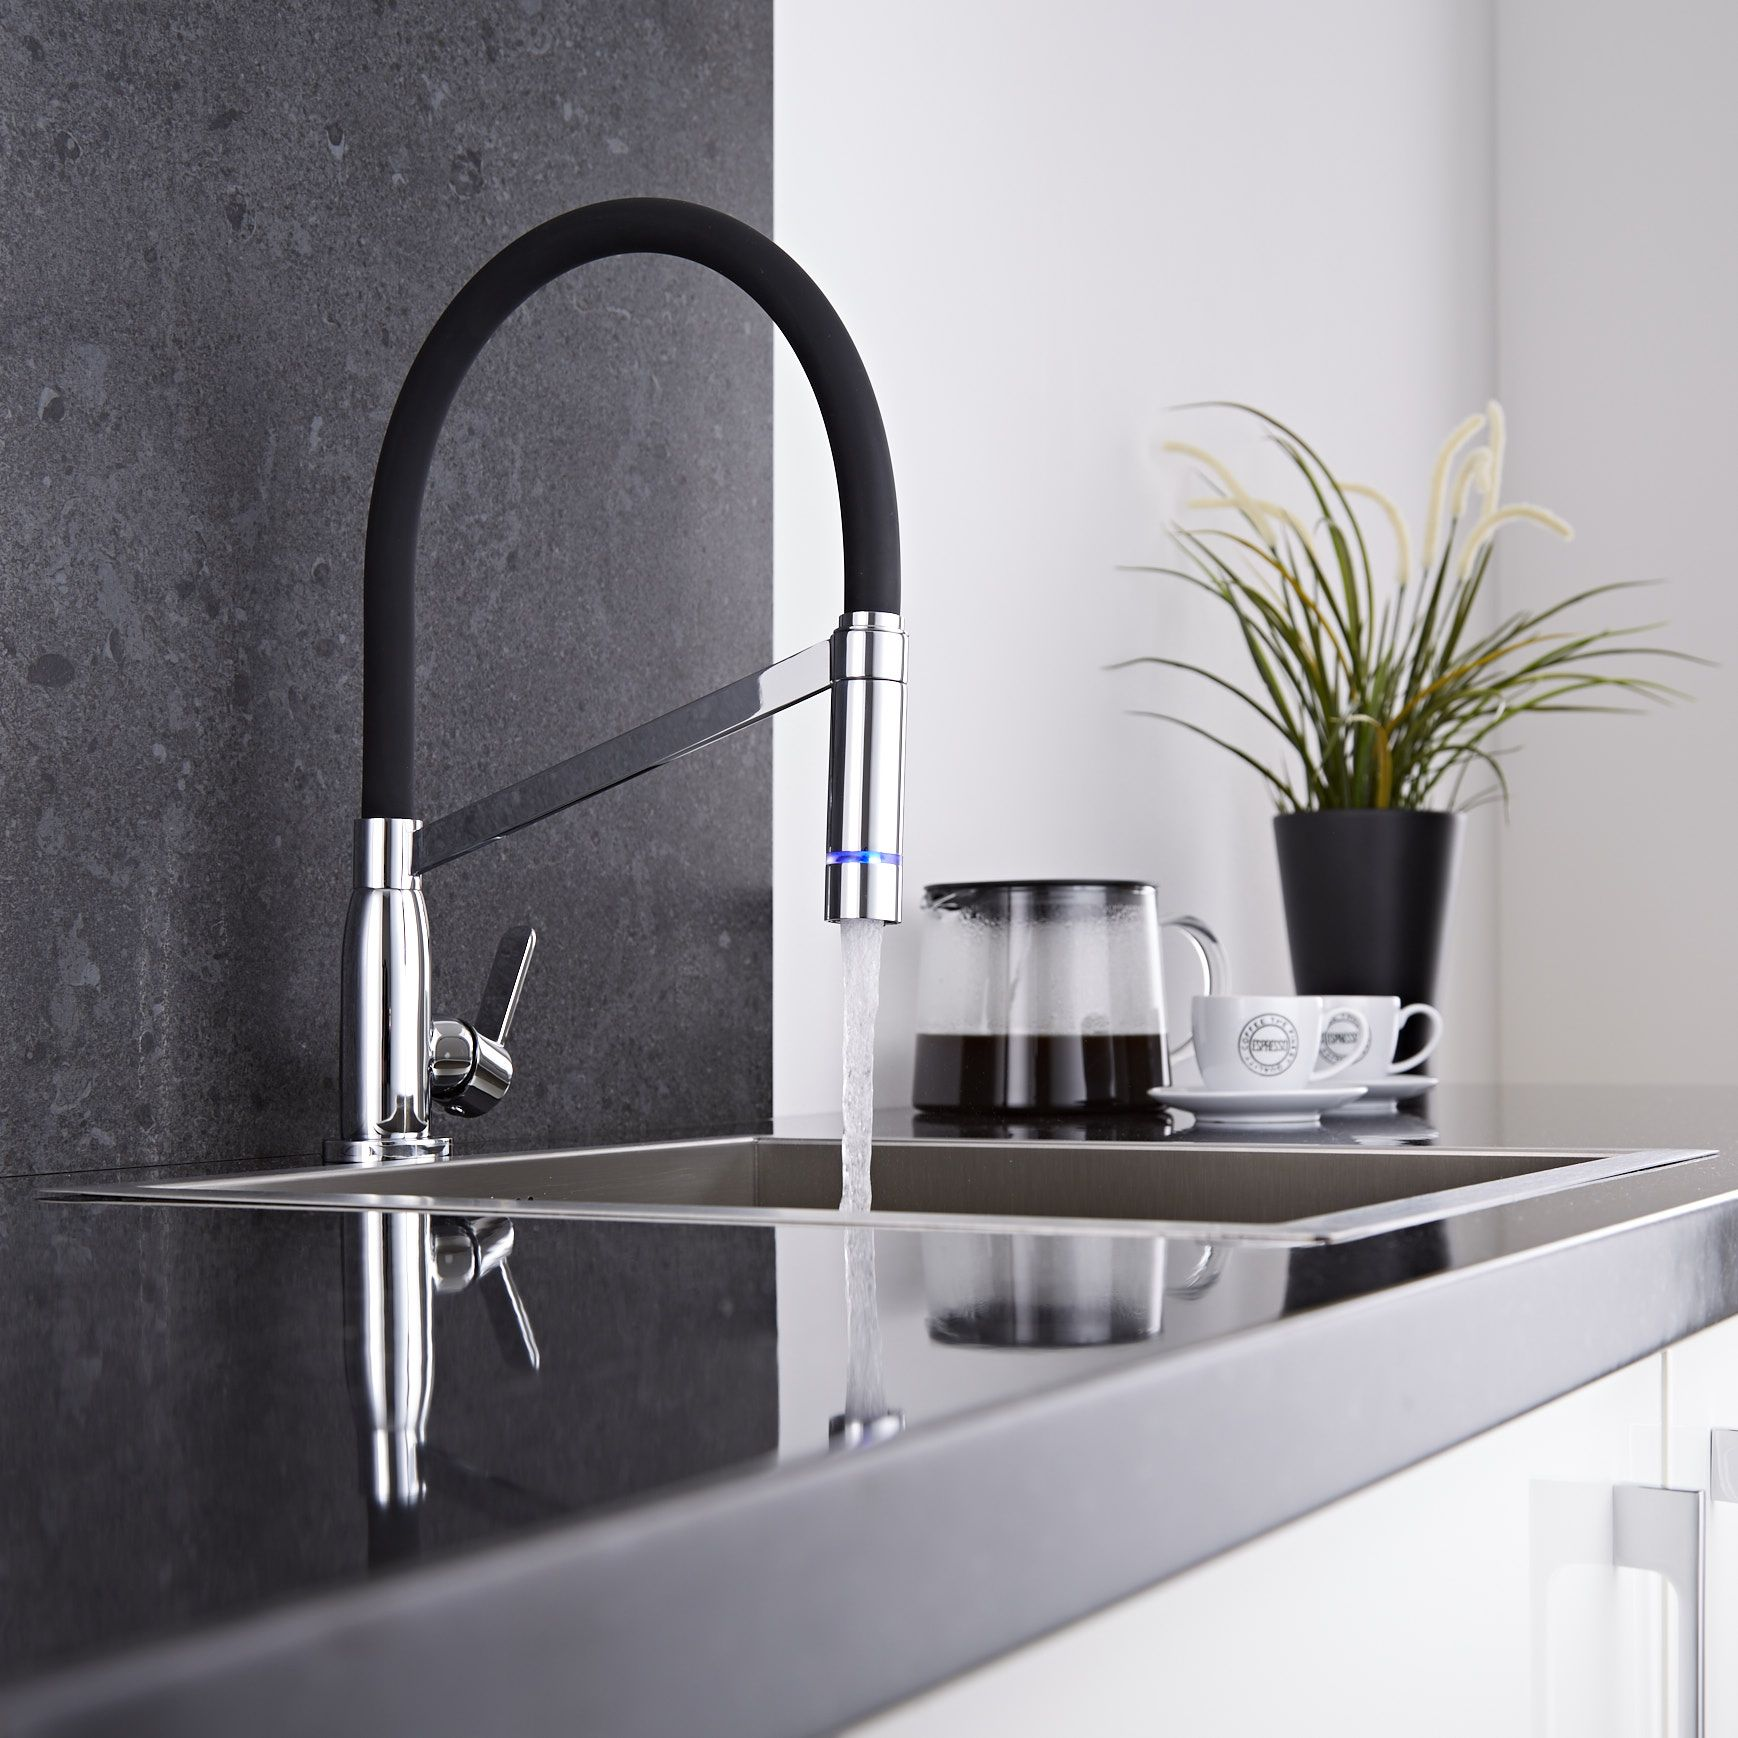 New Milano kitchen mixer tap coming soon to BigBathroomShop